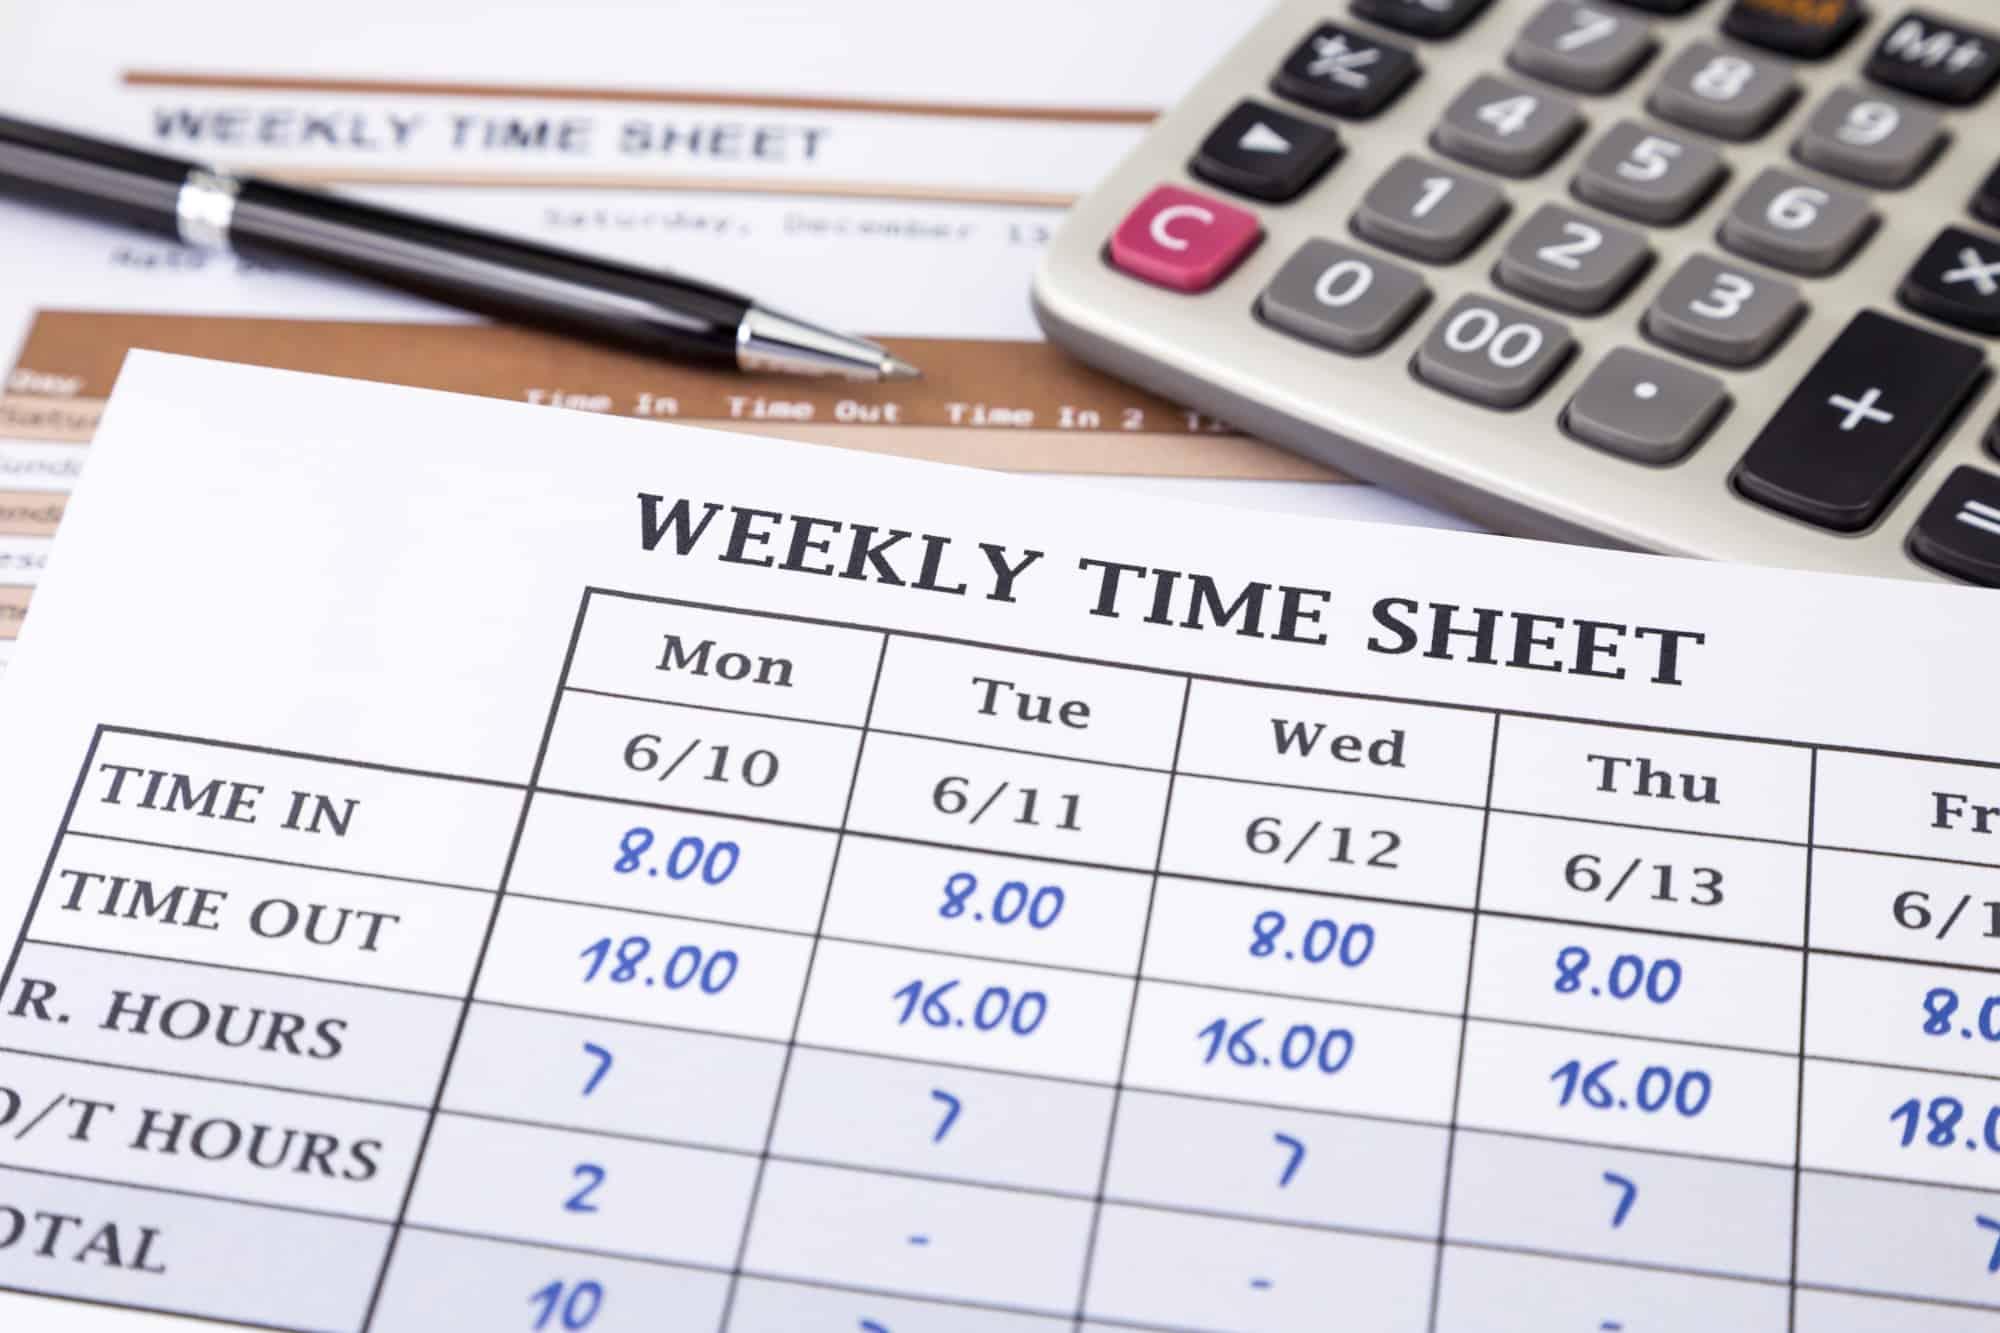 Weekly timesheet used to run payroll.